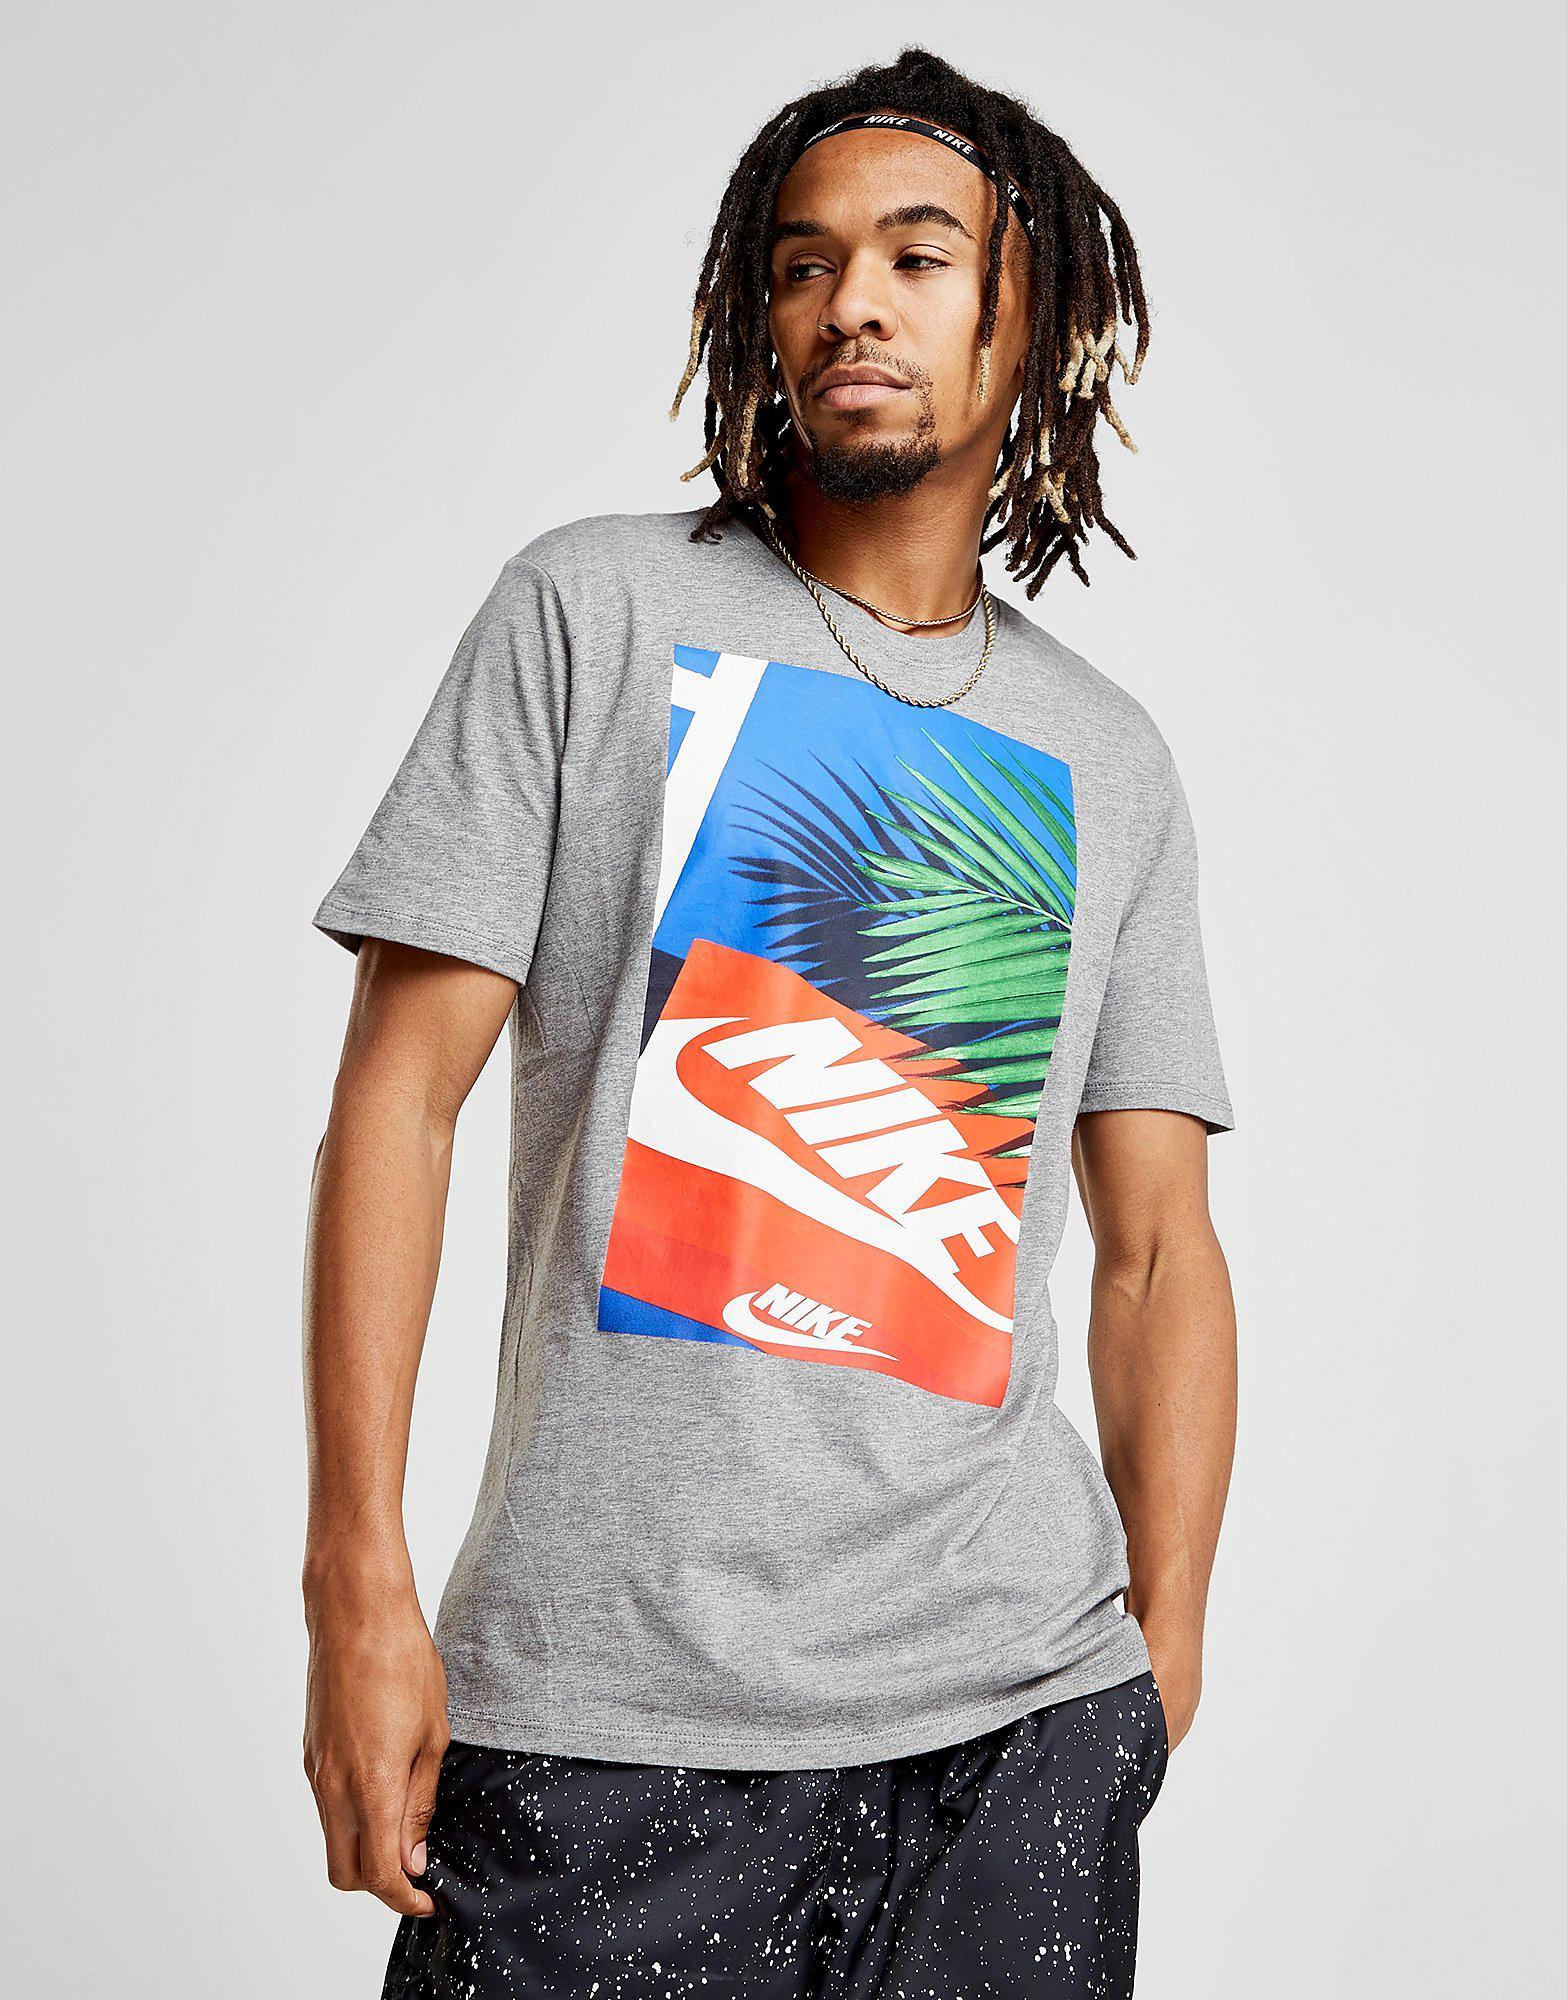 Nike Shoe Box Short Sleeve T-Shirt